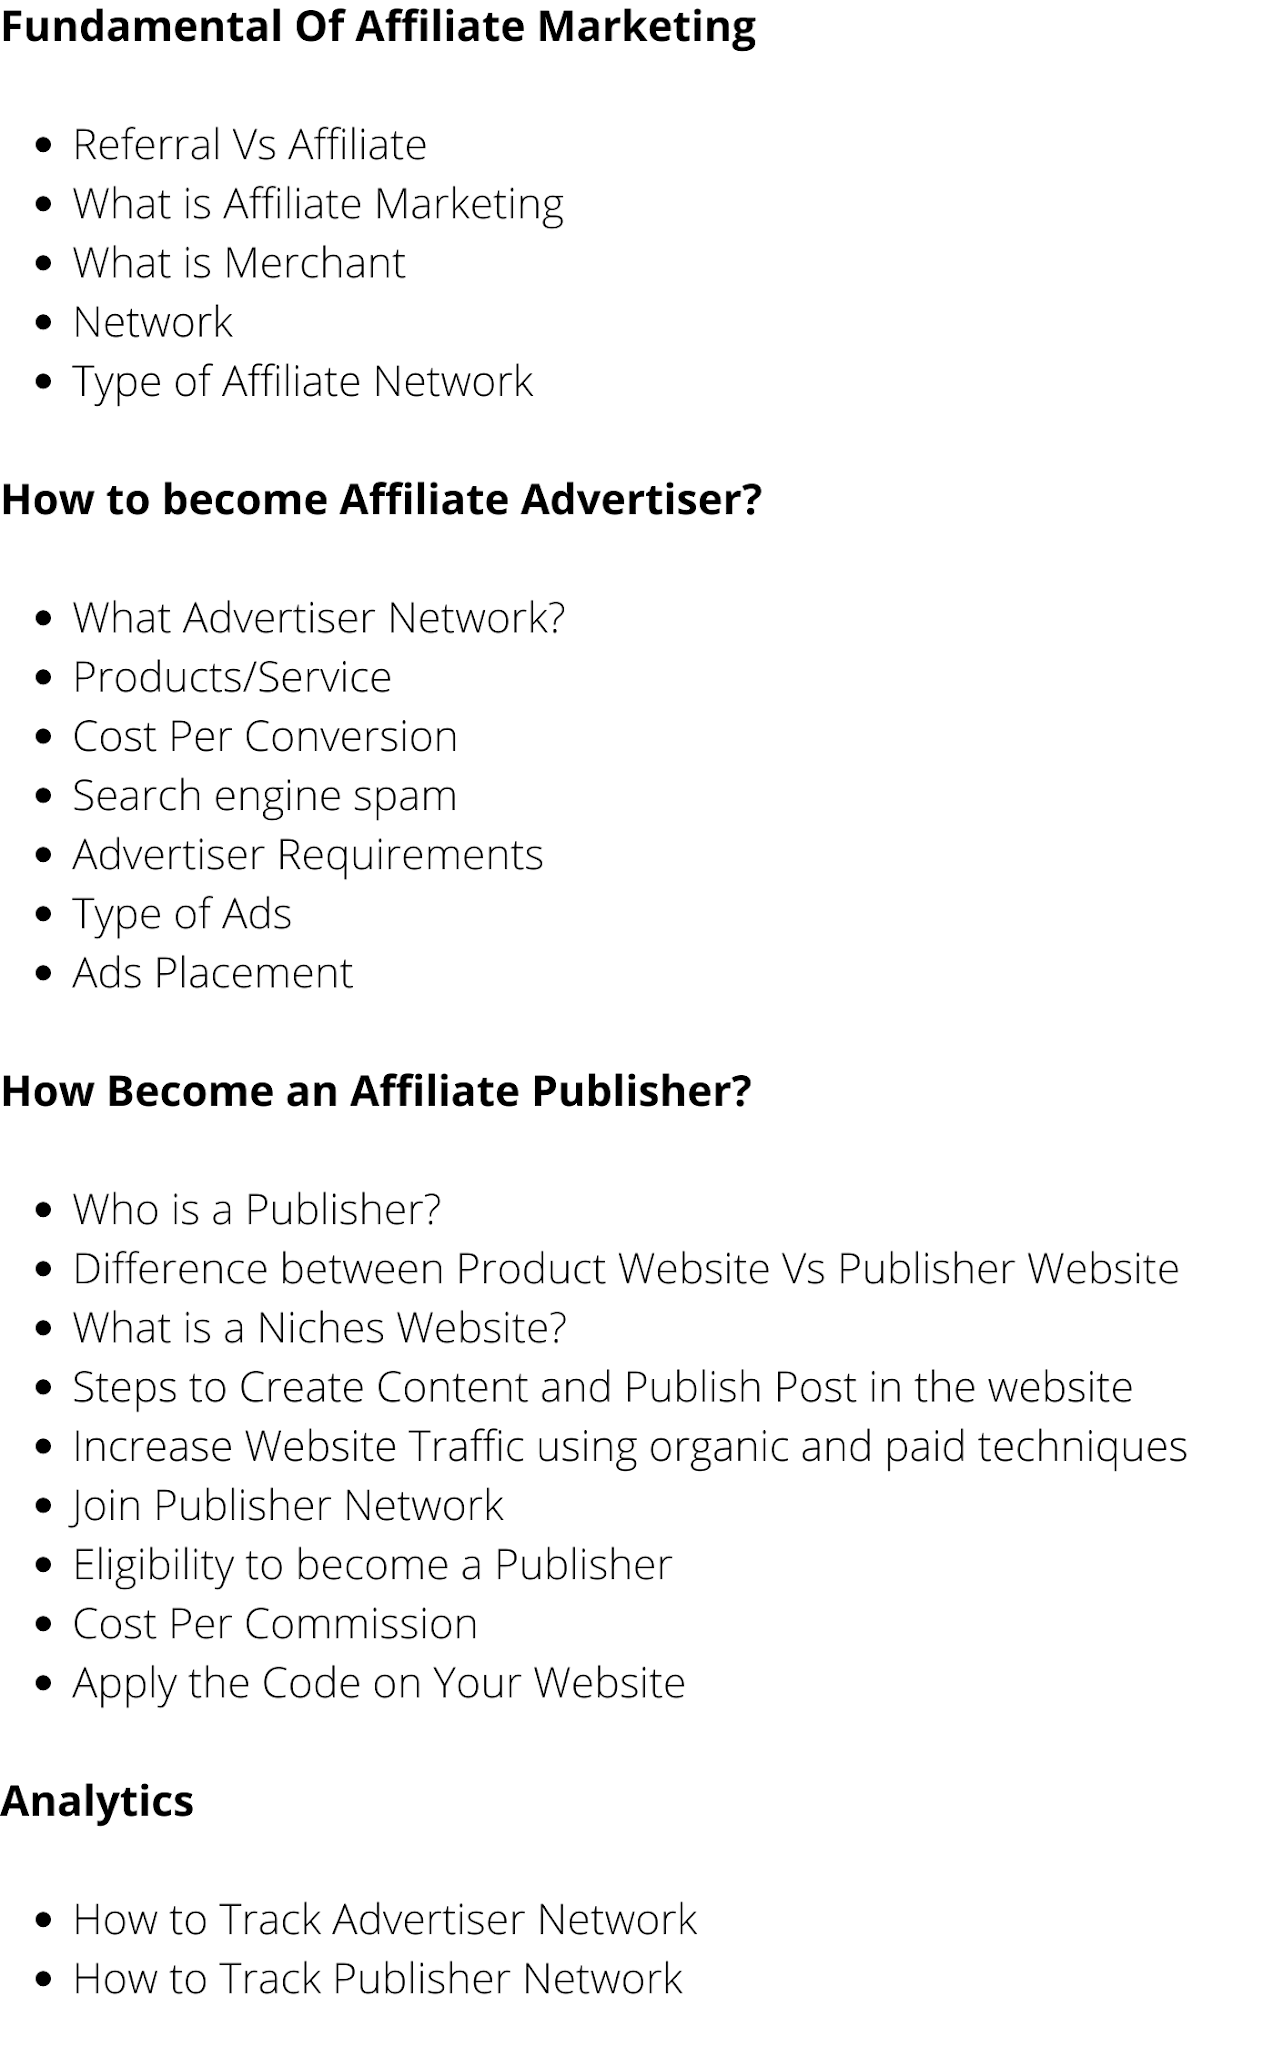 Affiliate Marketing Course Syllabus